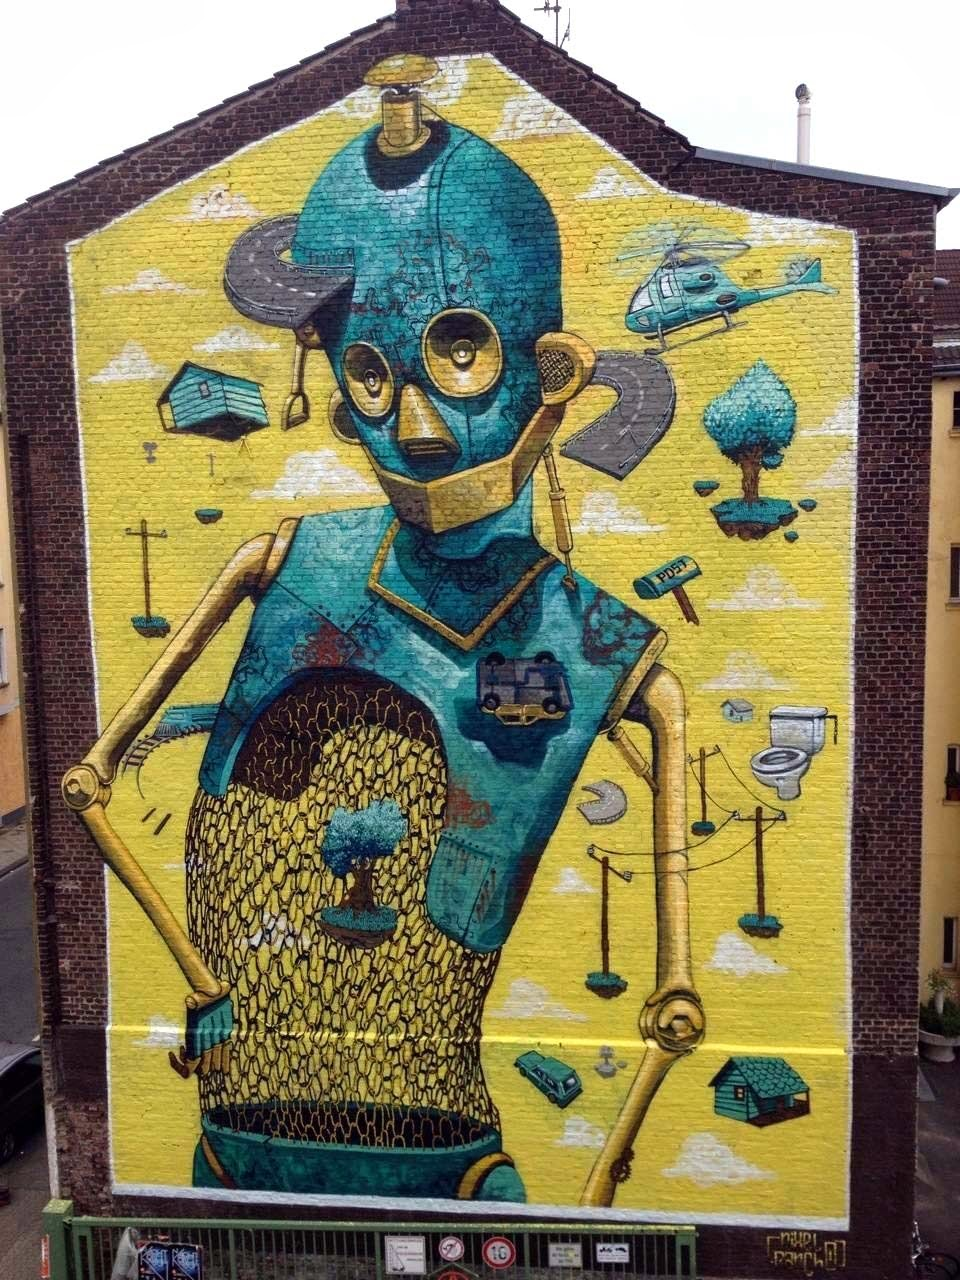 Pixel pancho rusted ideas new street art in dusseldorf for Mural street art